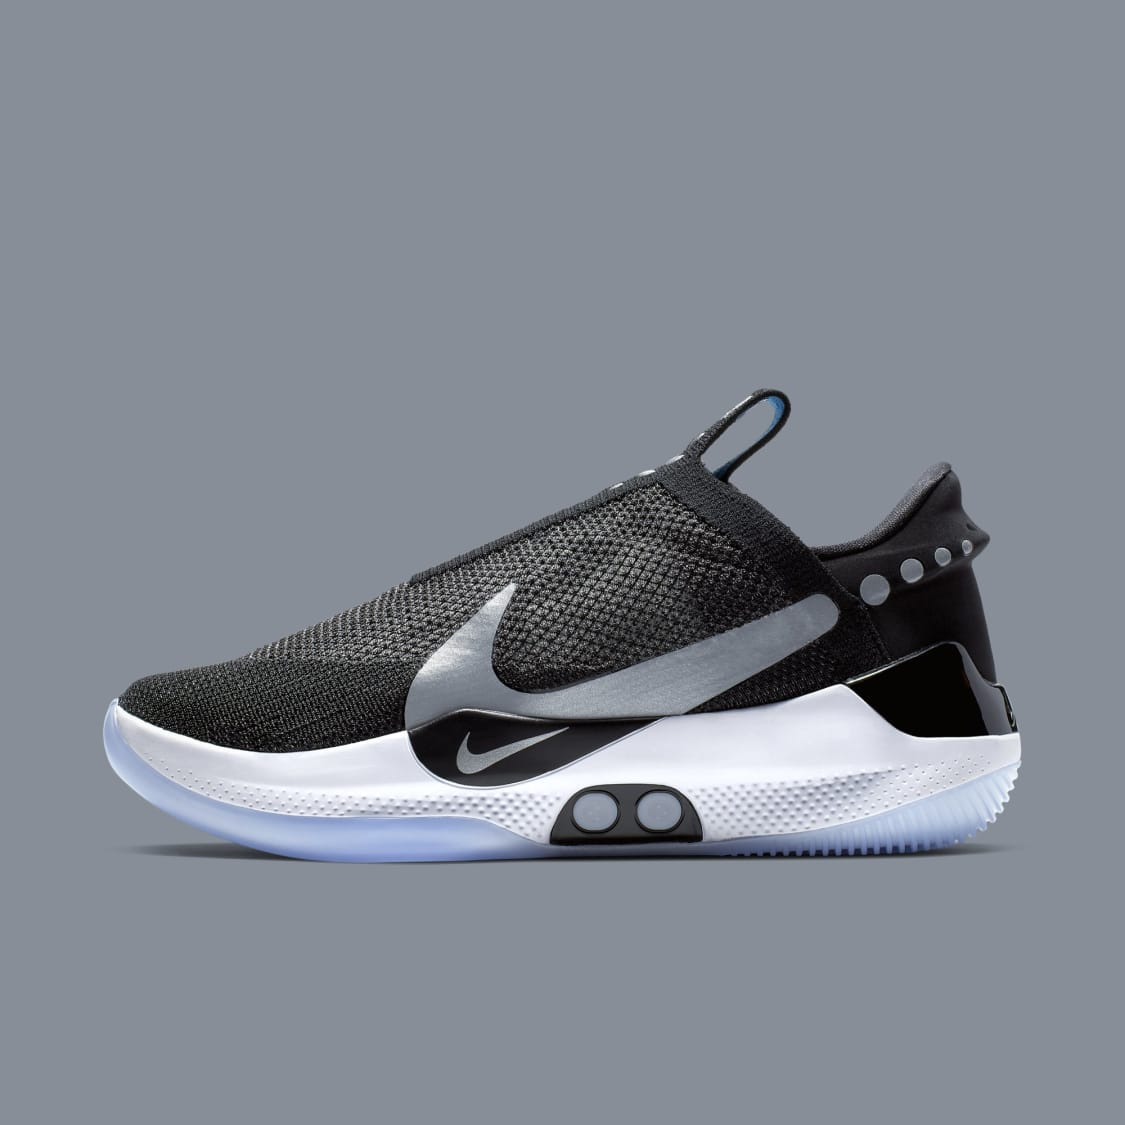 Reactions to Nike  Adapt BB Self-Lacing Basketball Sneaker  0002e9805